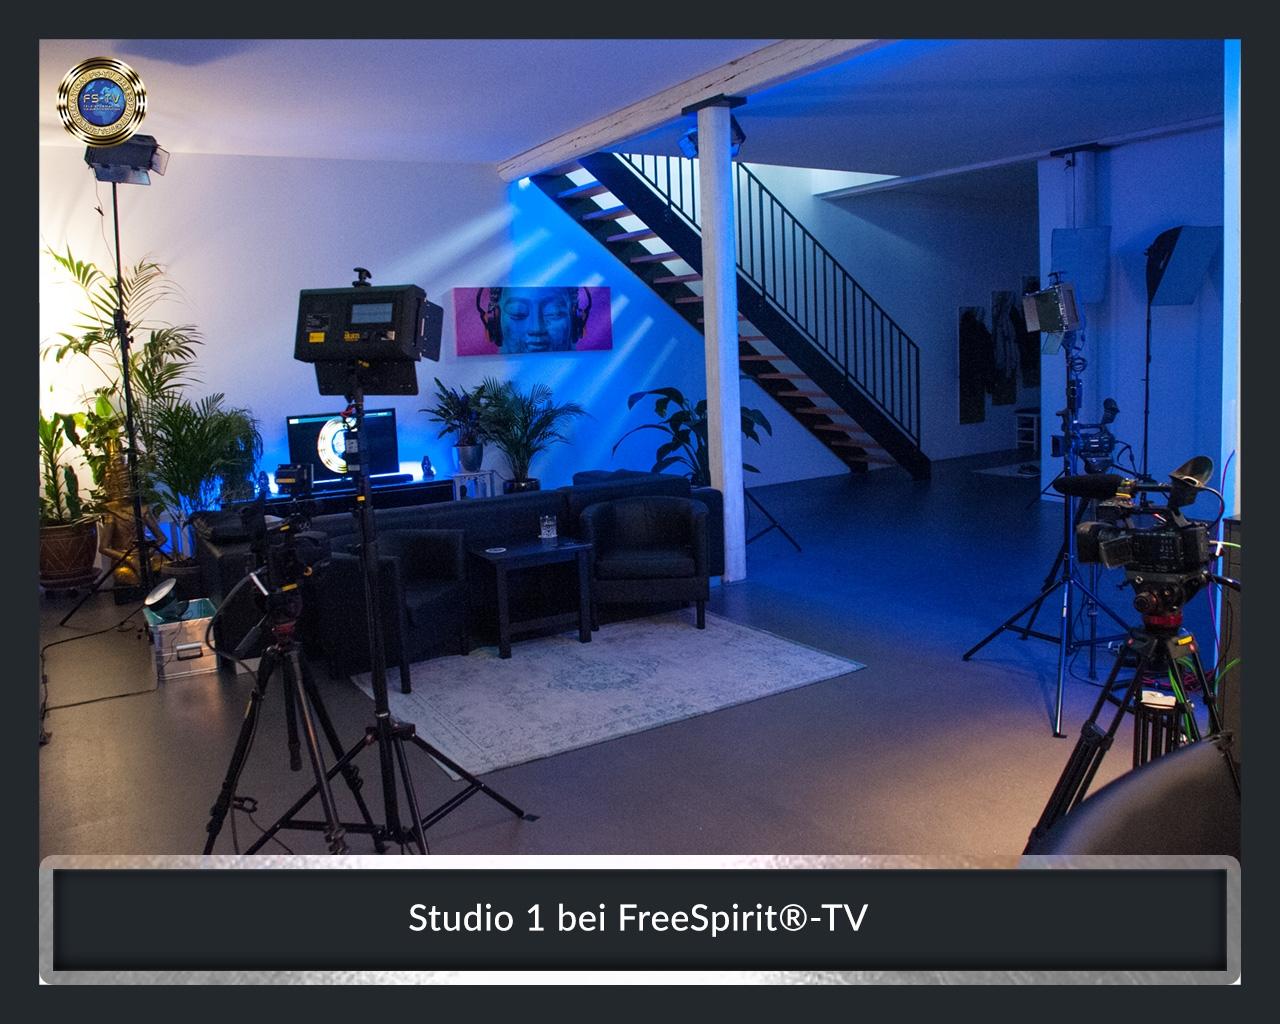 FS-TV-Bildergallerie-Studio1.2